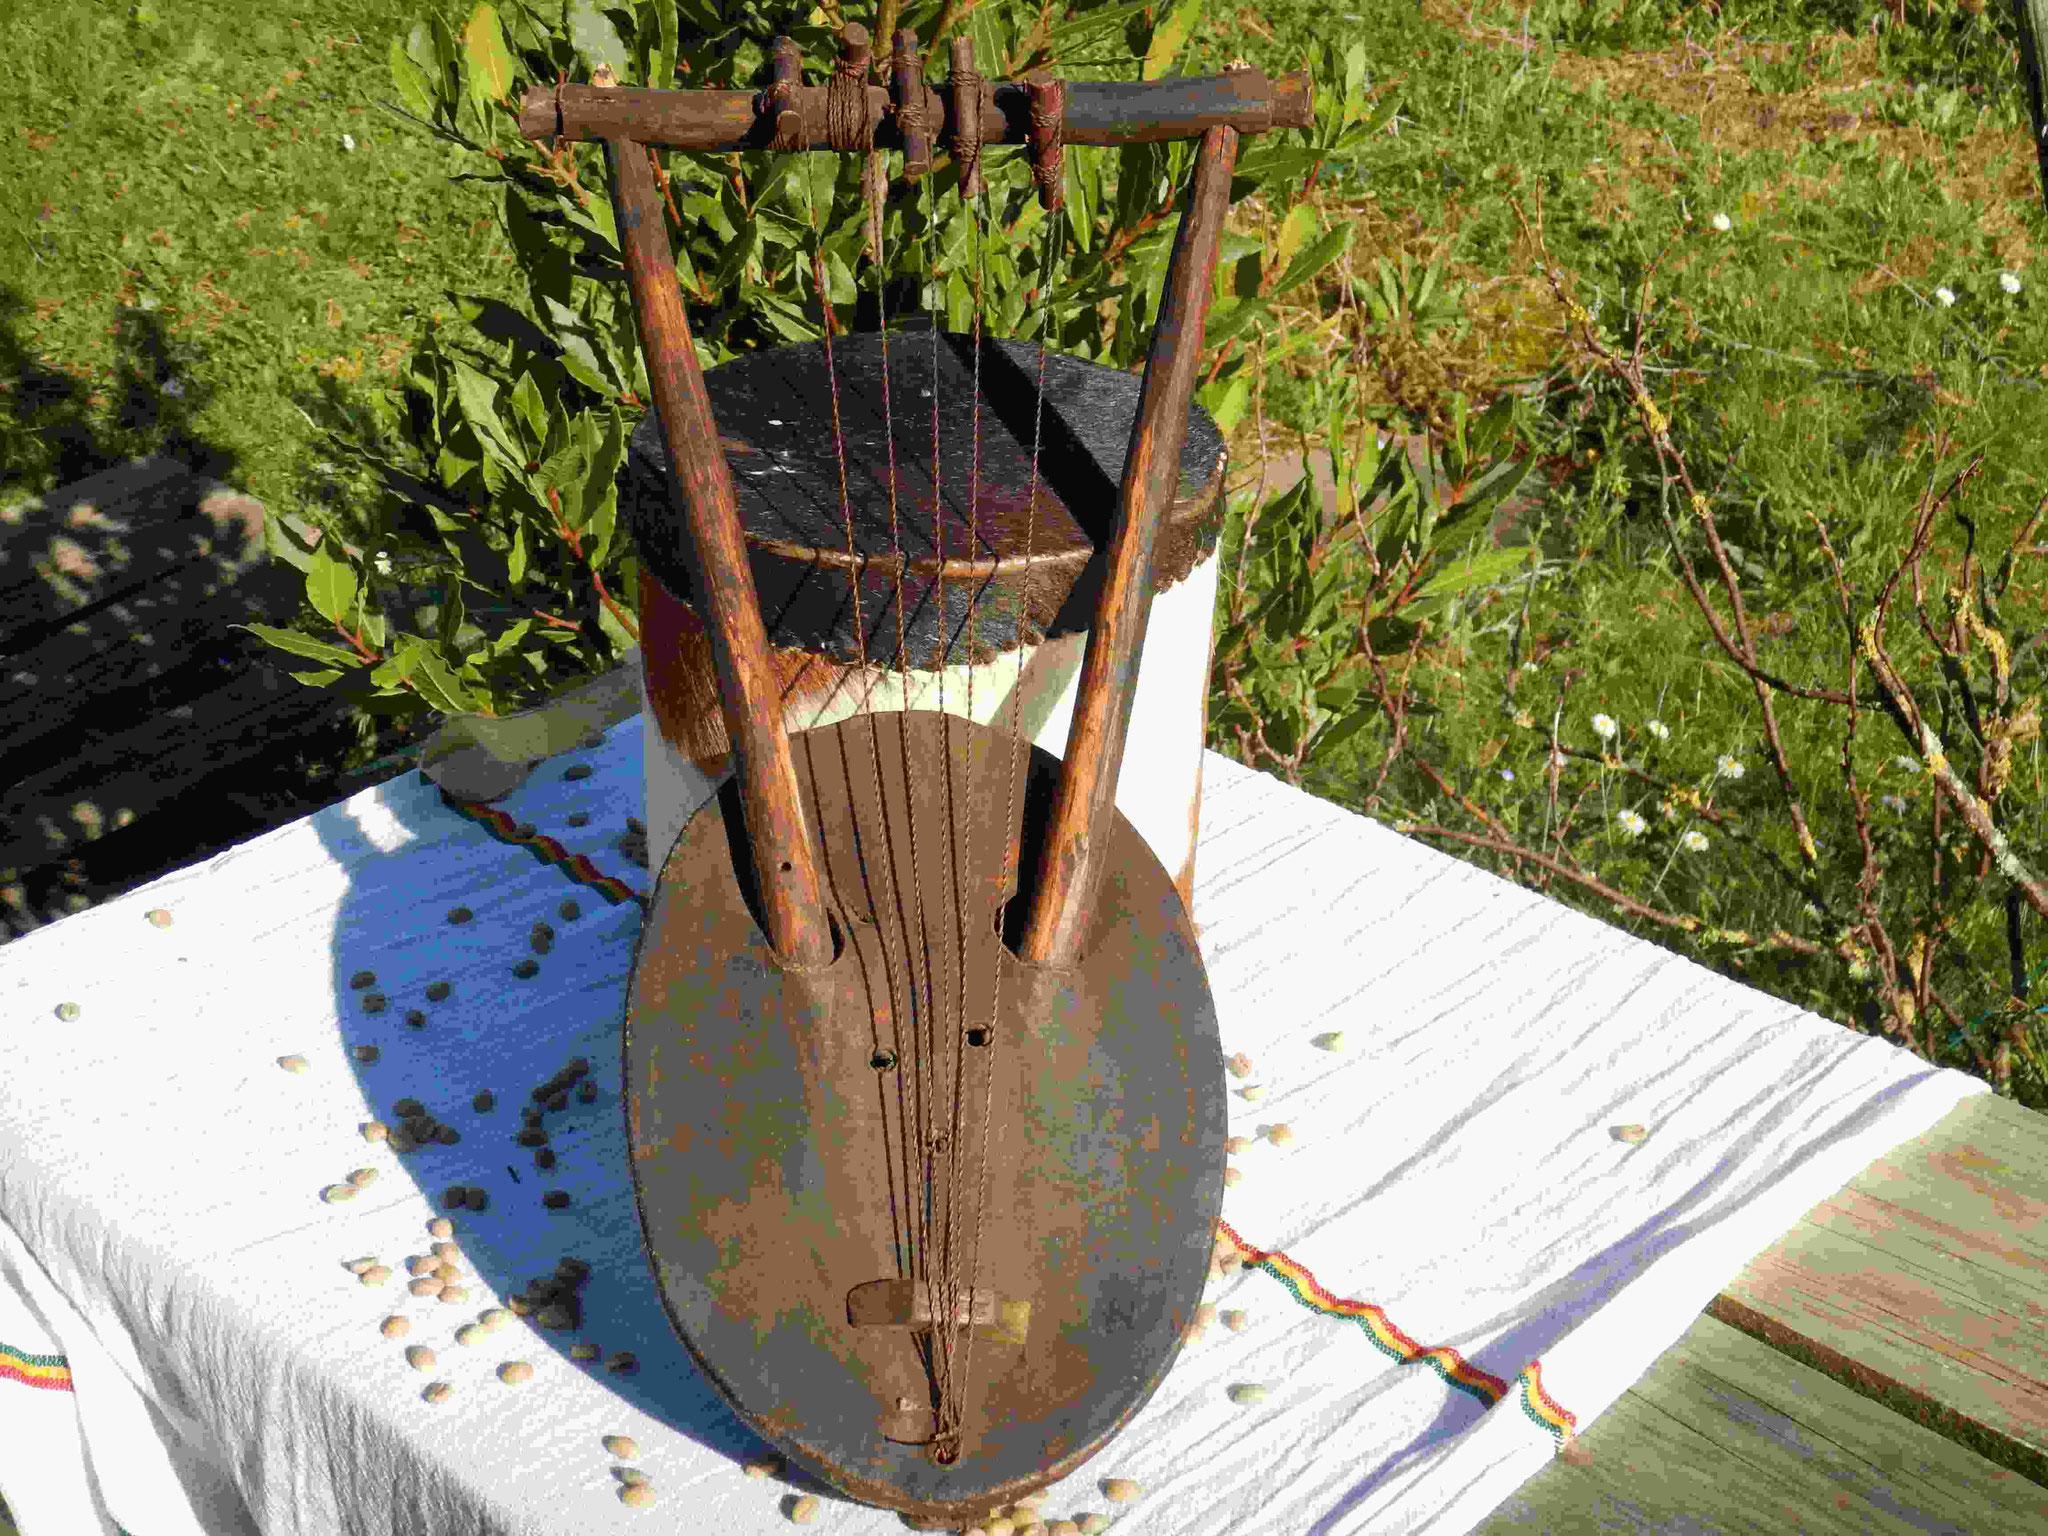 Instrument de musique éthiopien Ethiopie Artisanat ethiopien Epices éthiopiennes made by locals solidaire équitable artisanat textils voyage Ethiopie